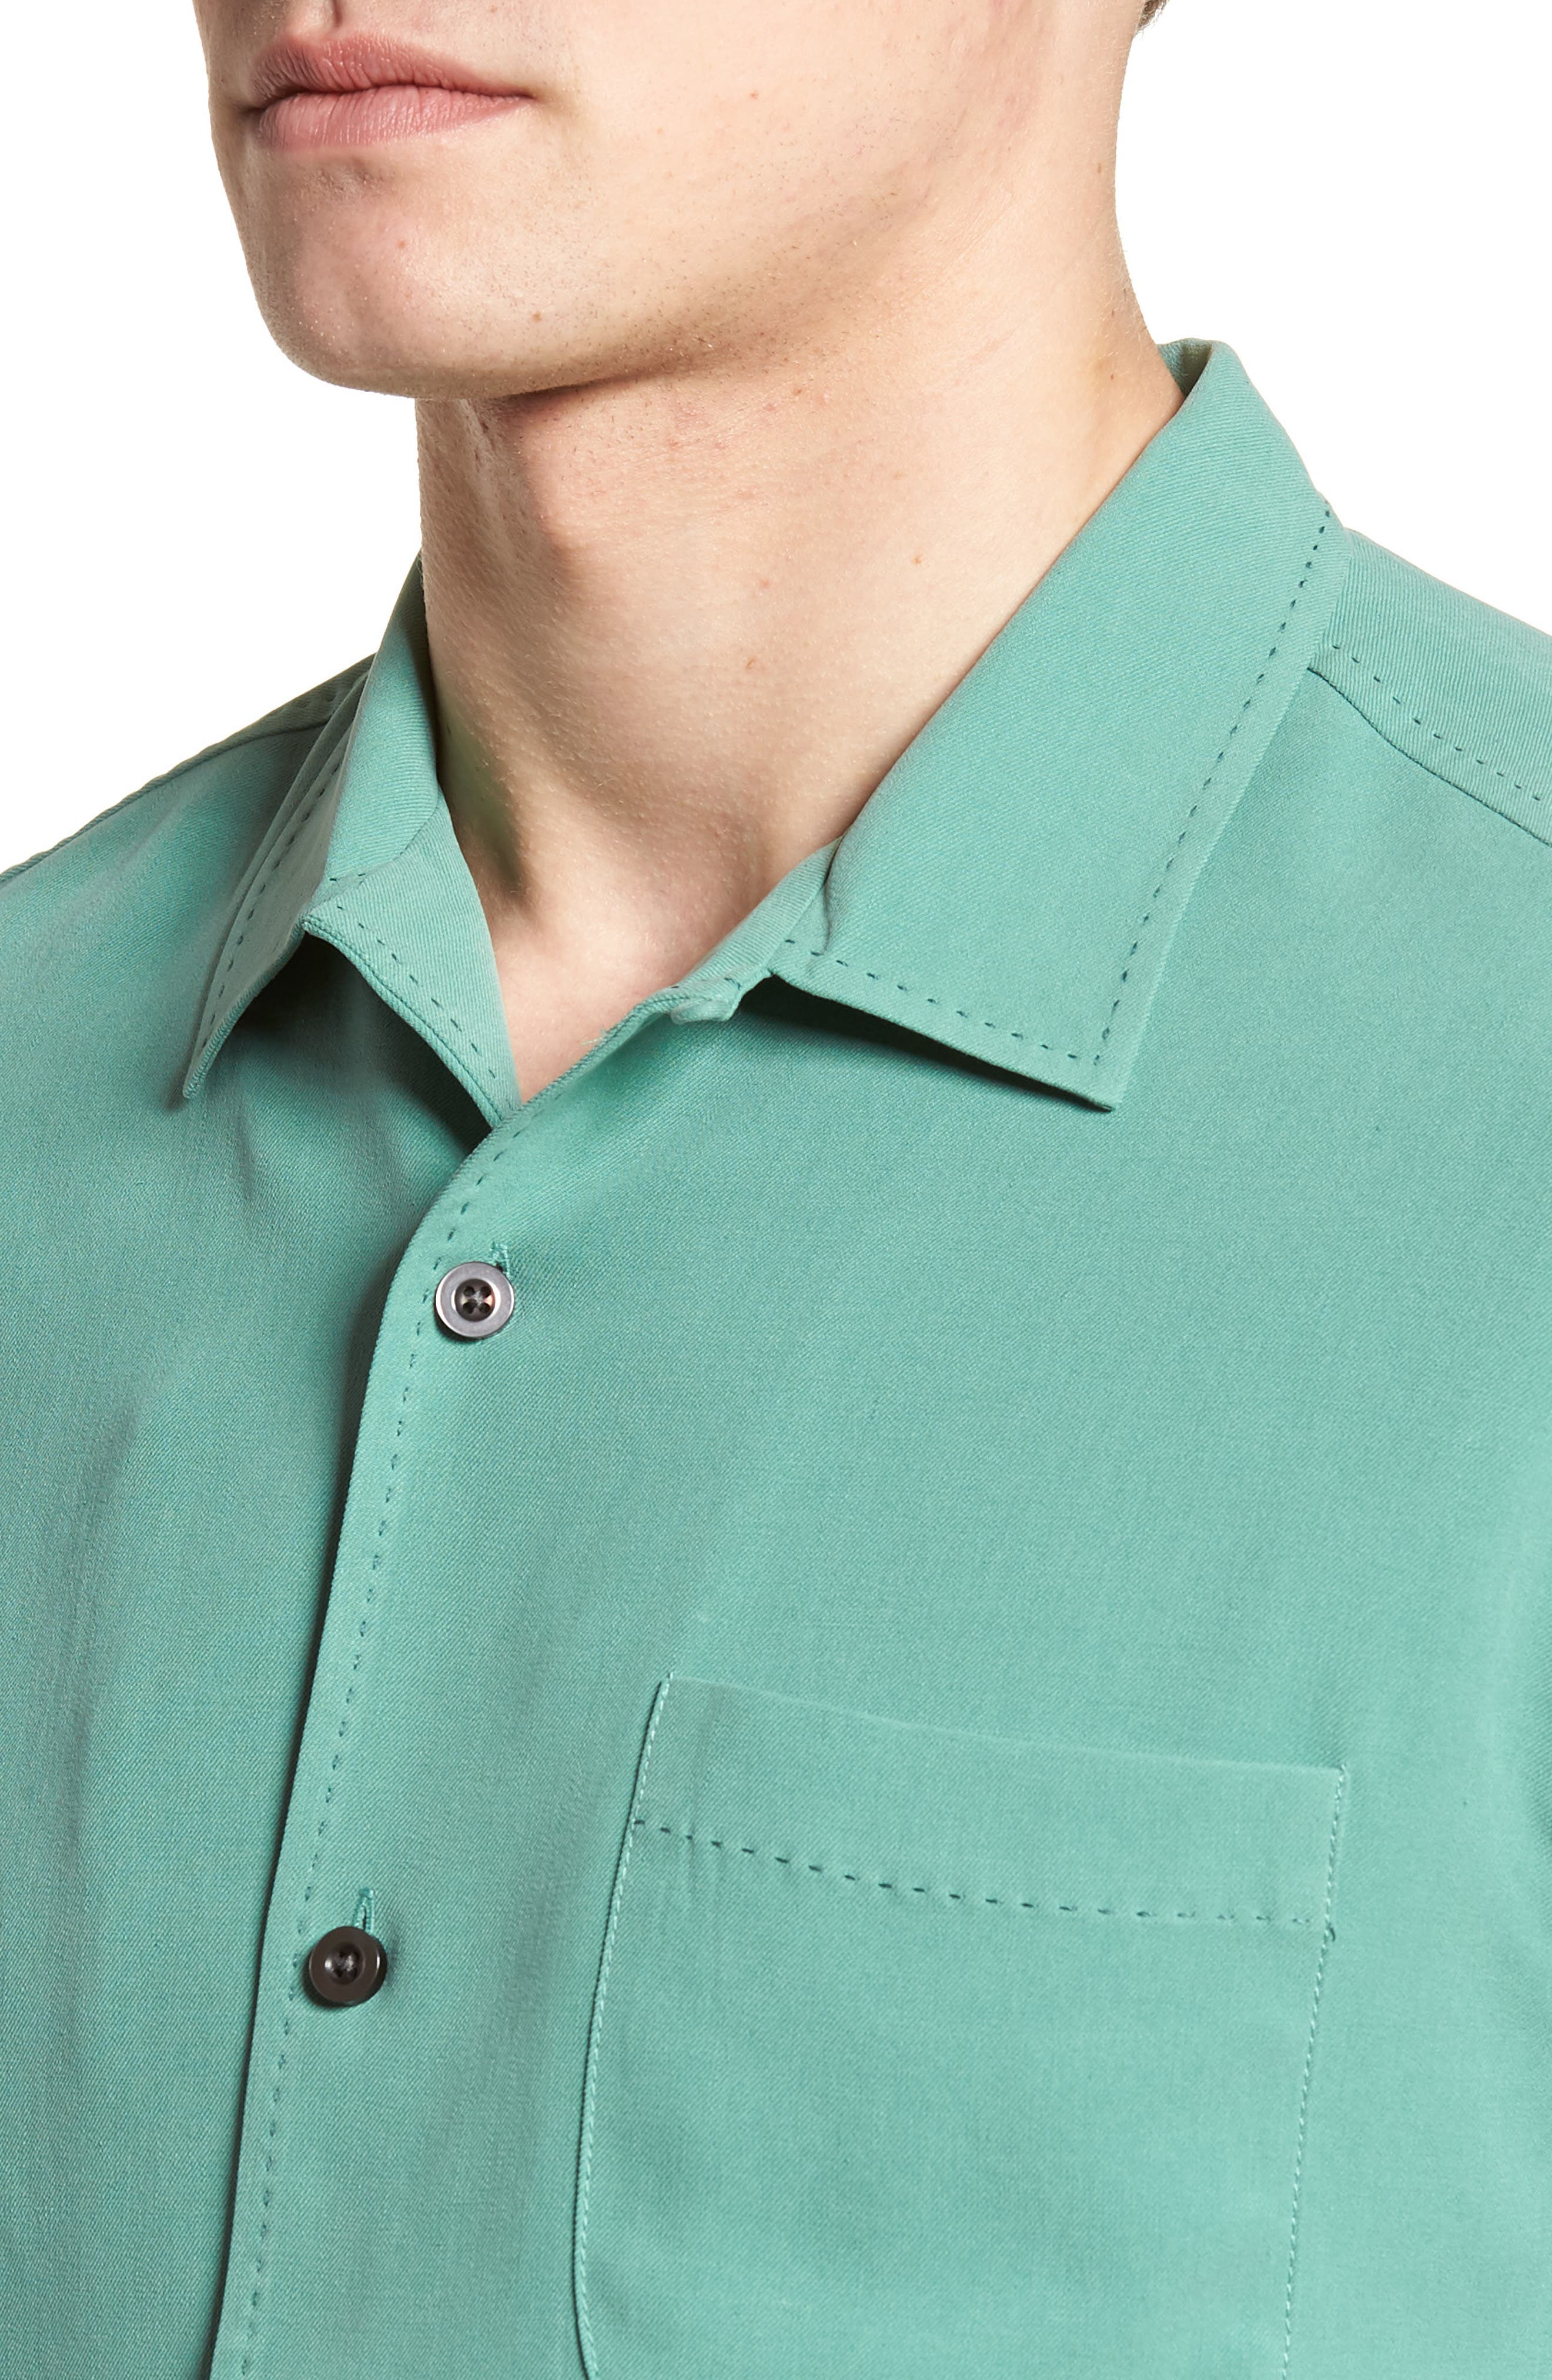 'Catalina Twill' Original Fit Silk Camp Shirt,                             Alternate thumbnail 4, color,                             306